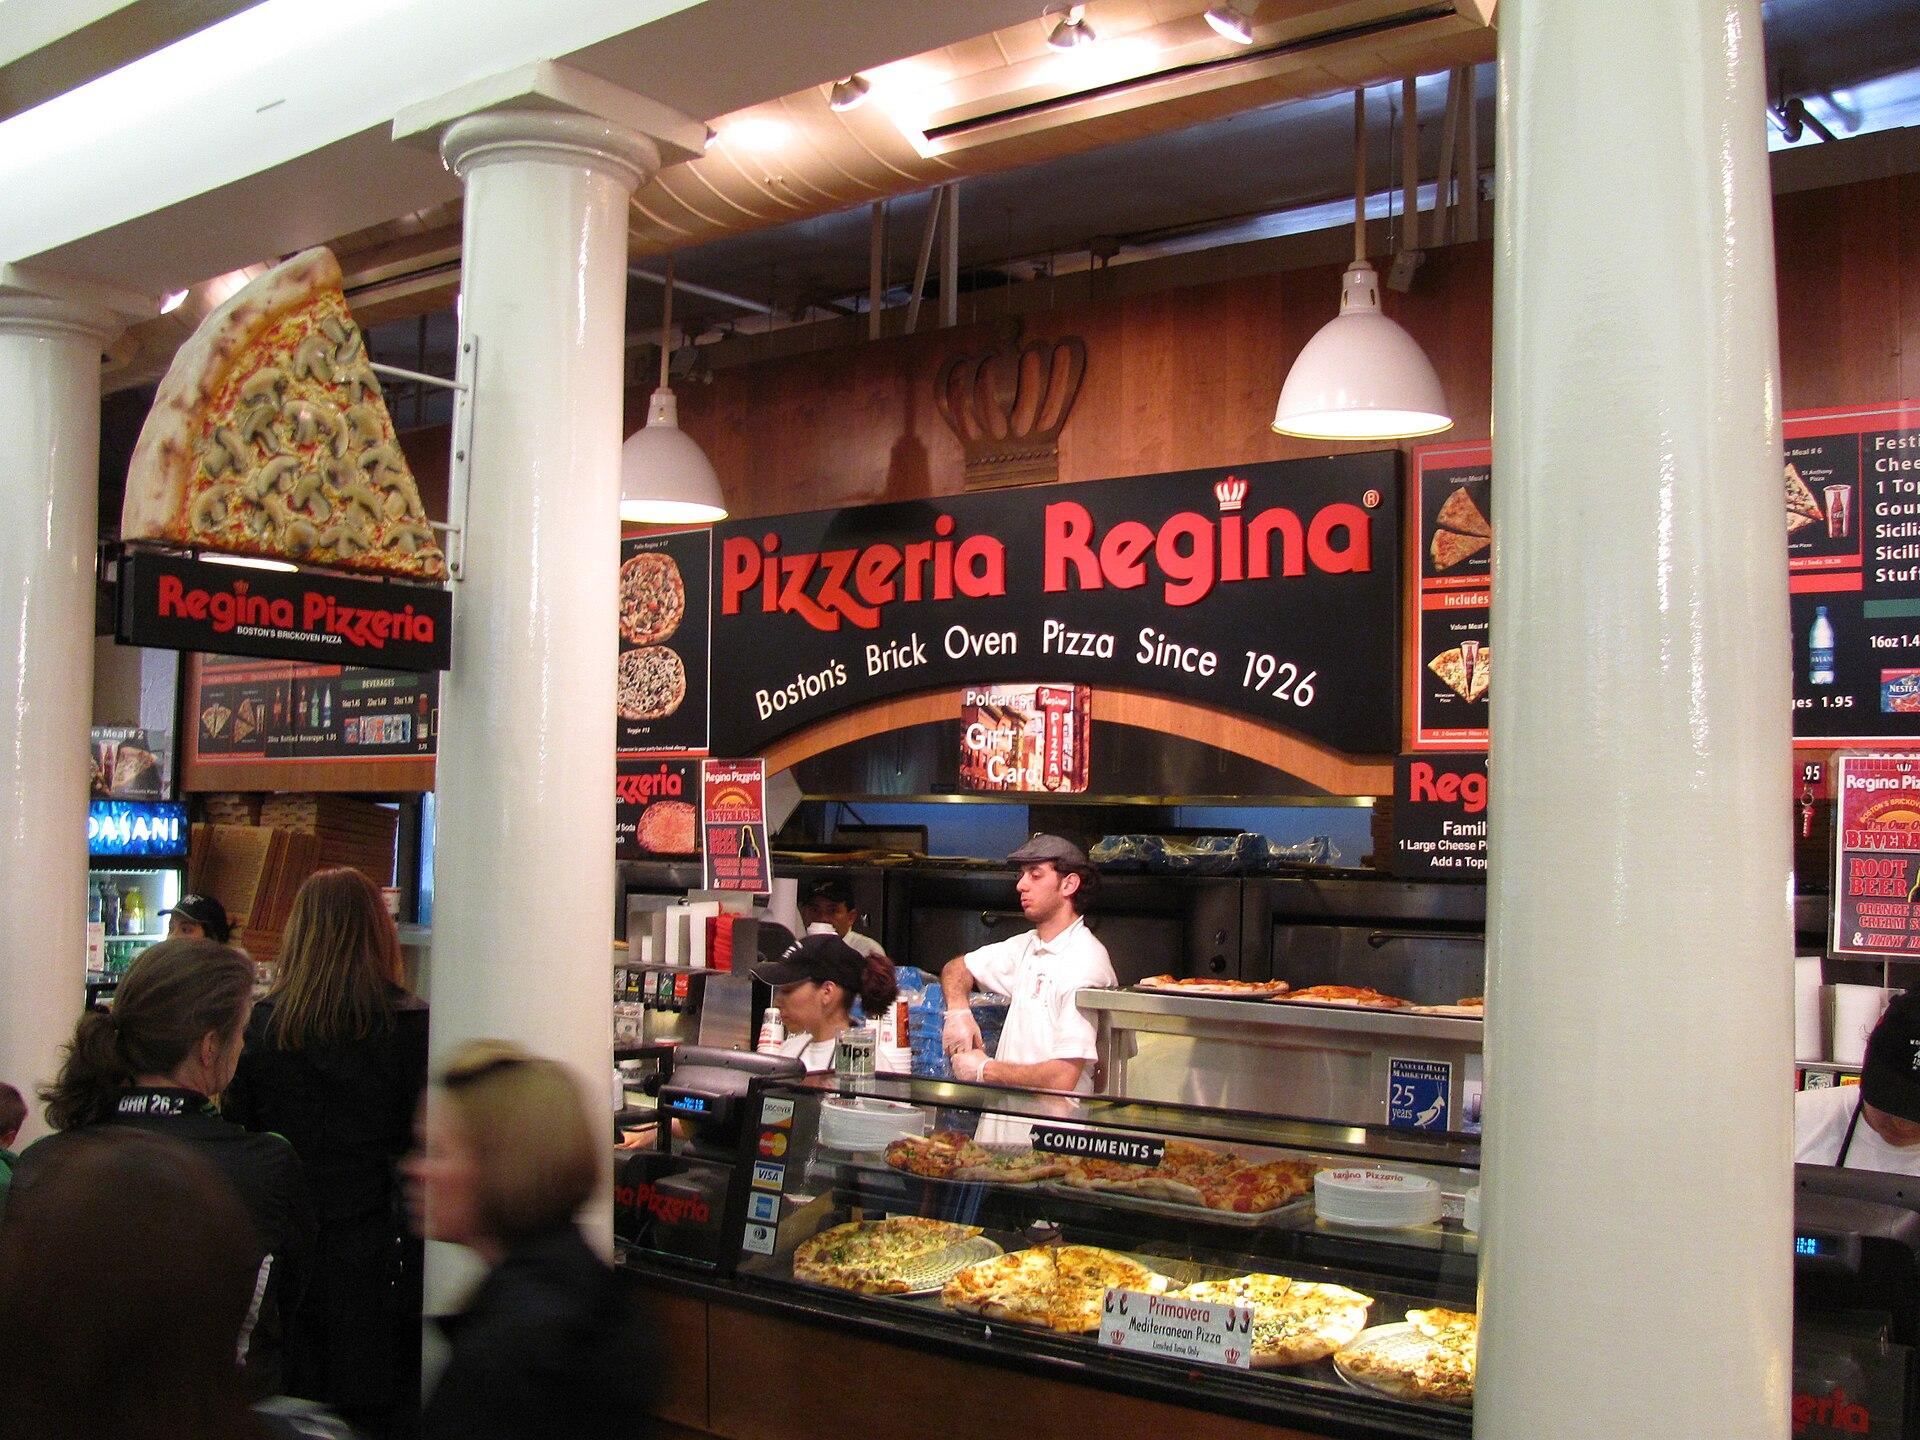 Regina Pizzeria - Wikipedia